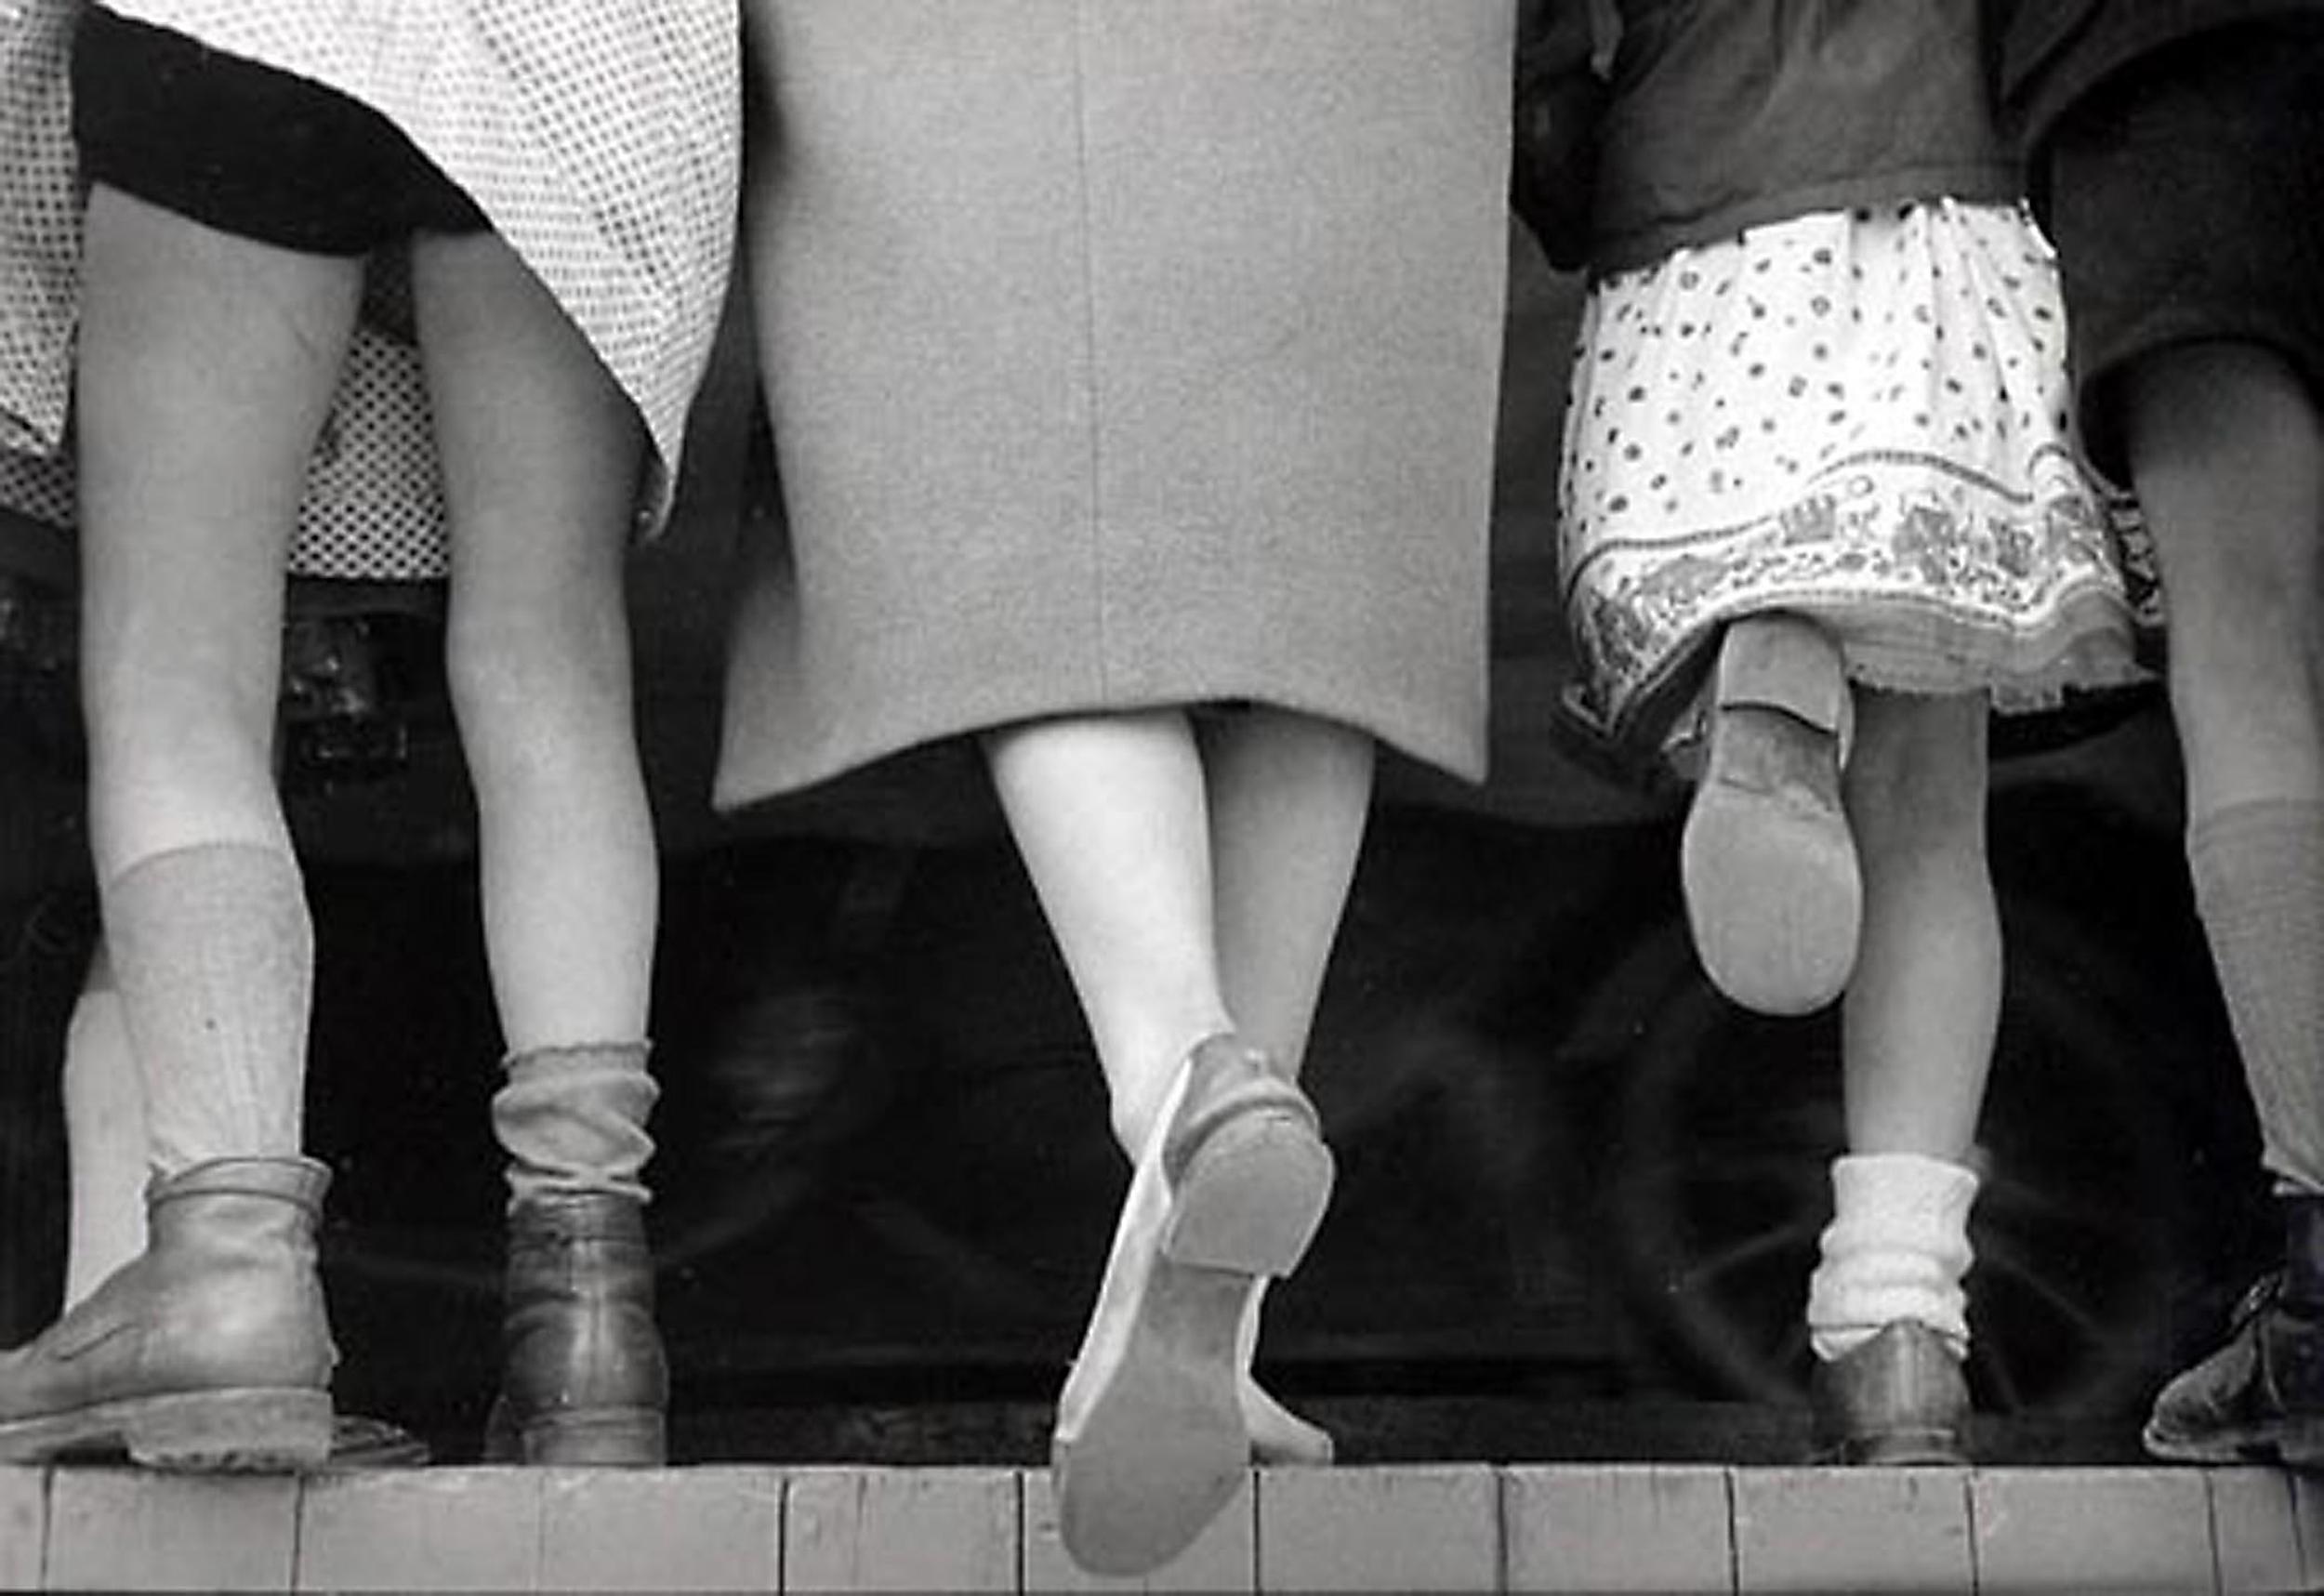 HANNON_three_girls_tivoli_gardens_(copenhagen)_1956_high.jpg